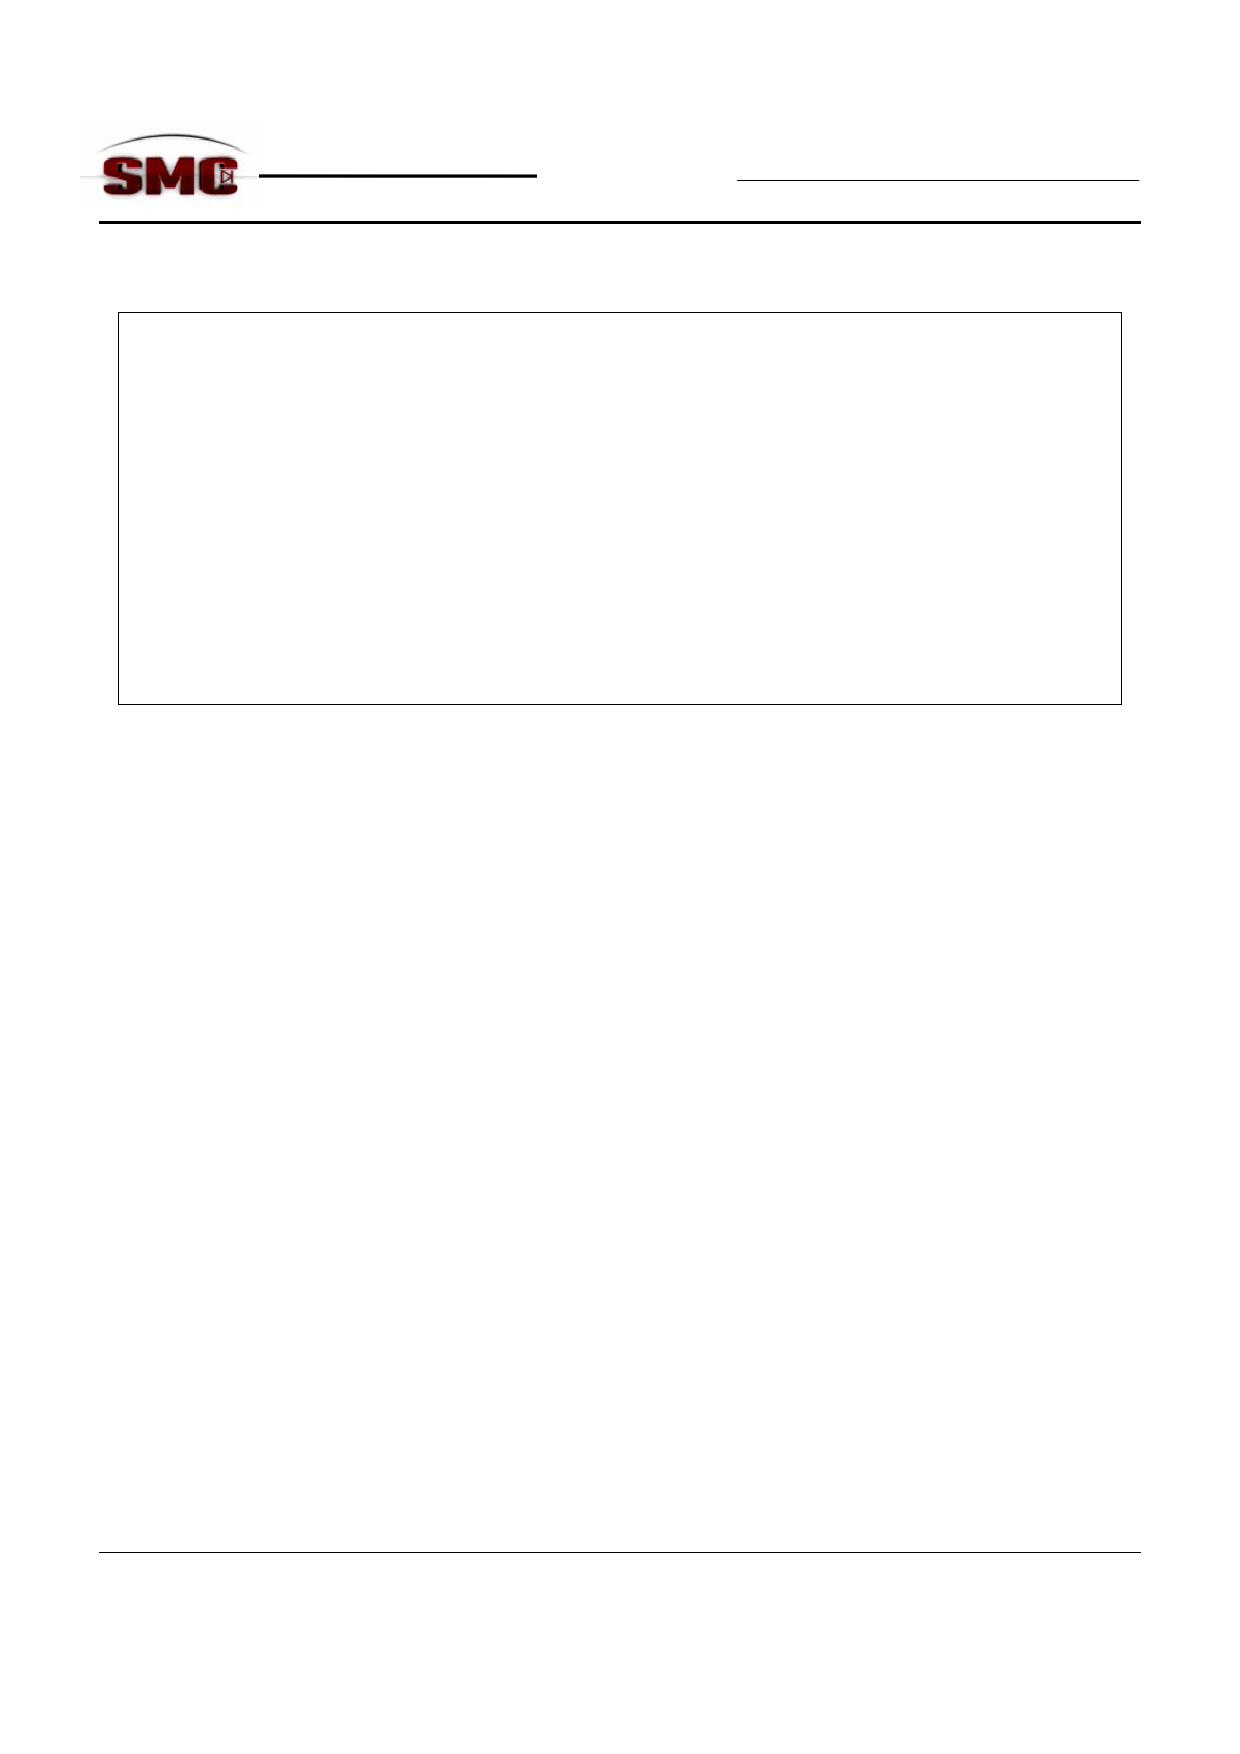 MR856 pdf, 반도체, 판매, 대치품